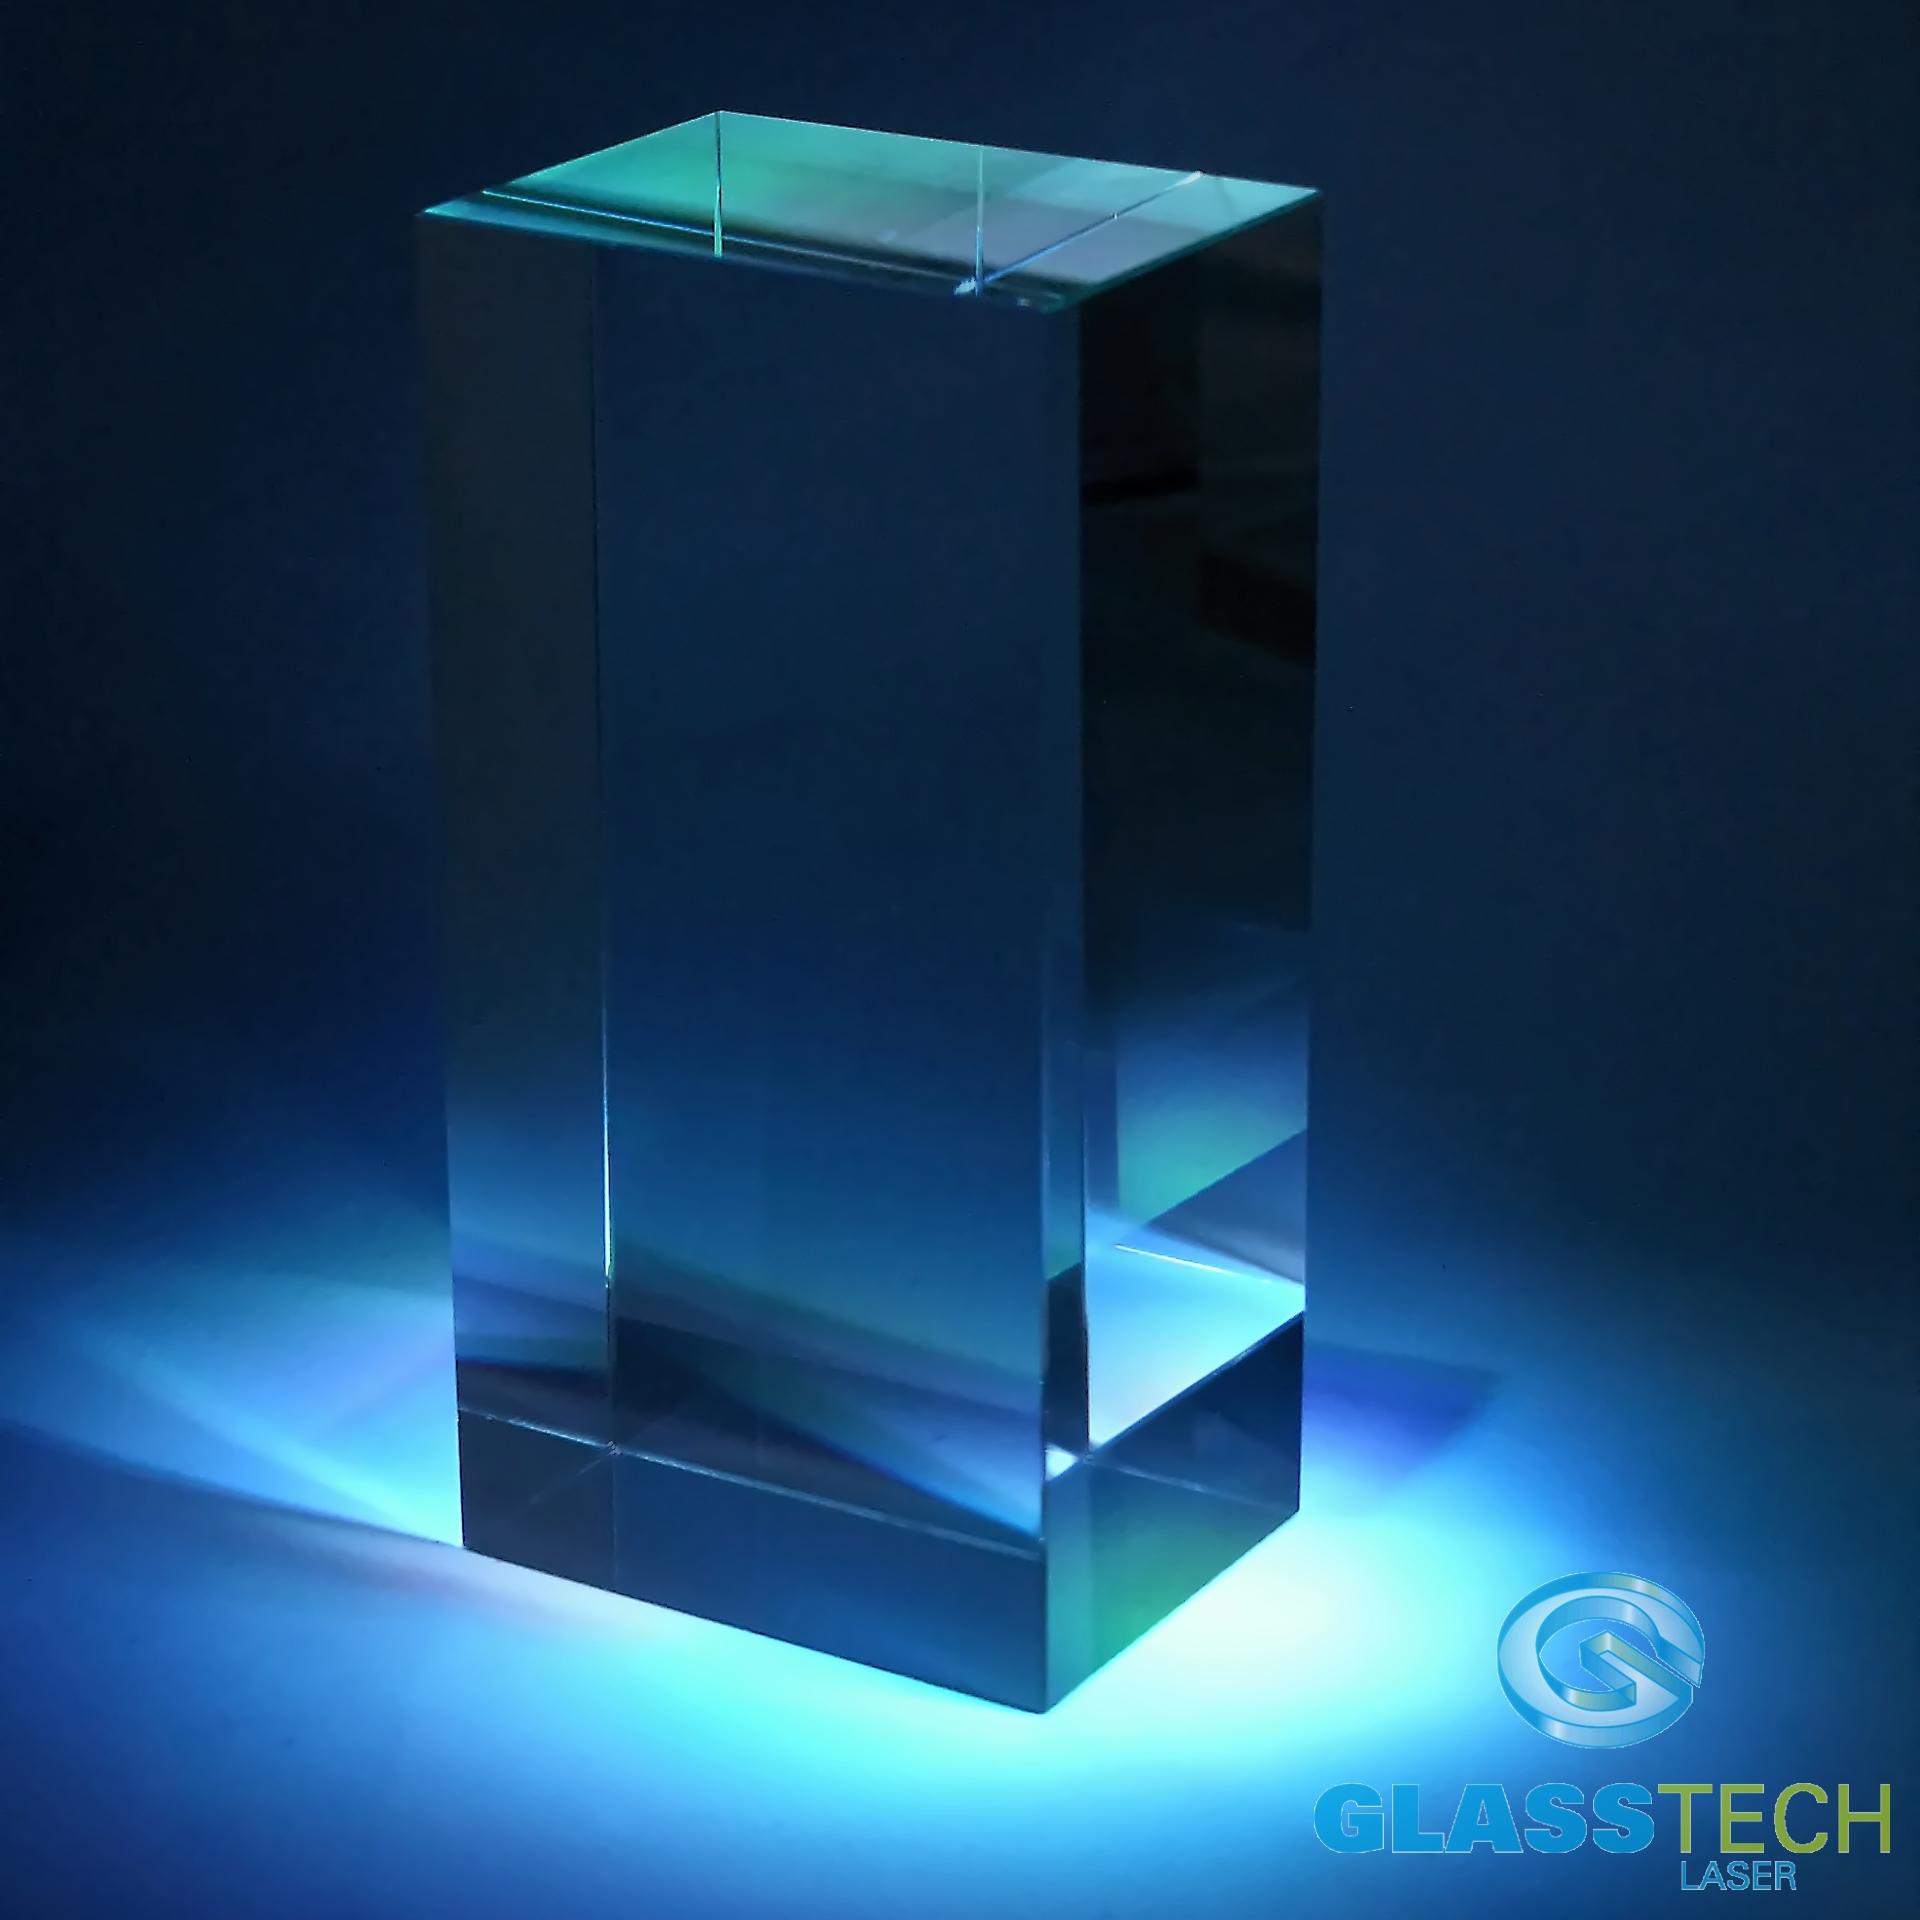 Glass block glass vases glass block 50x50x80 mm for Acrylic block windows